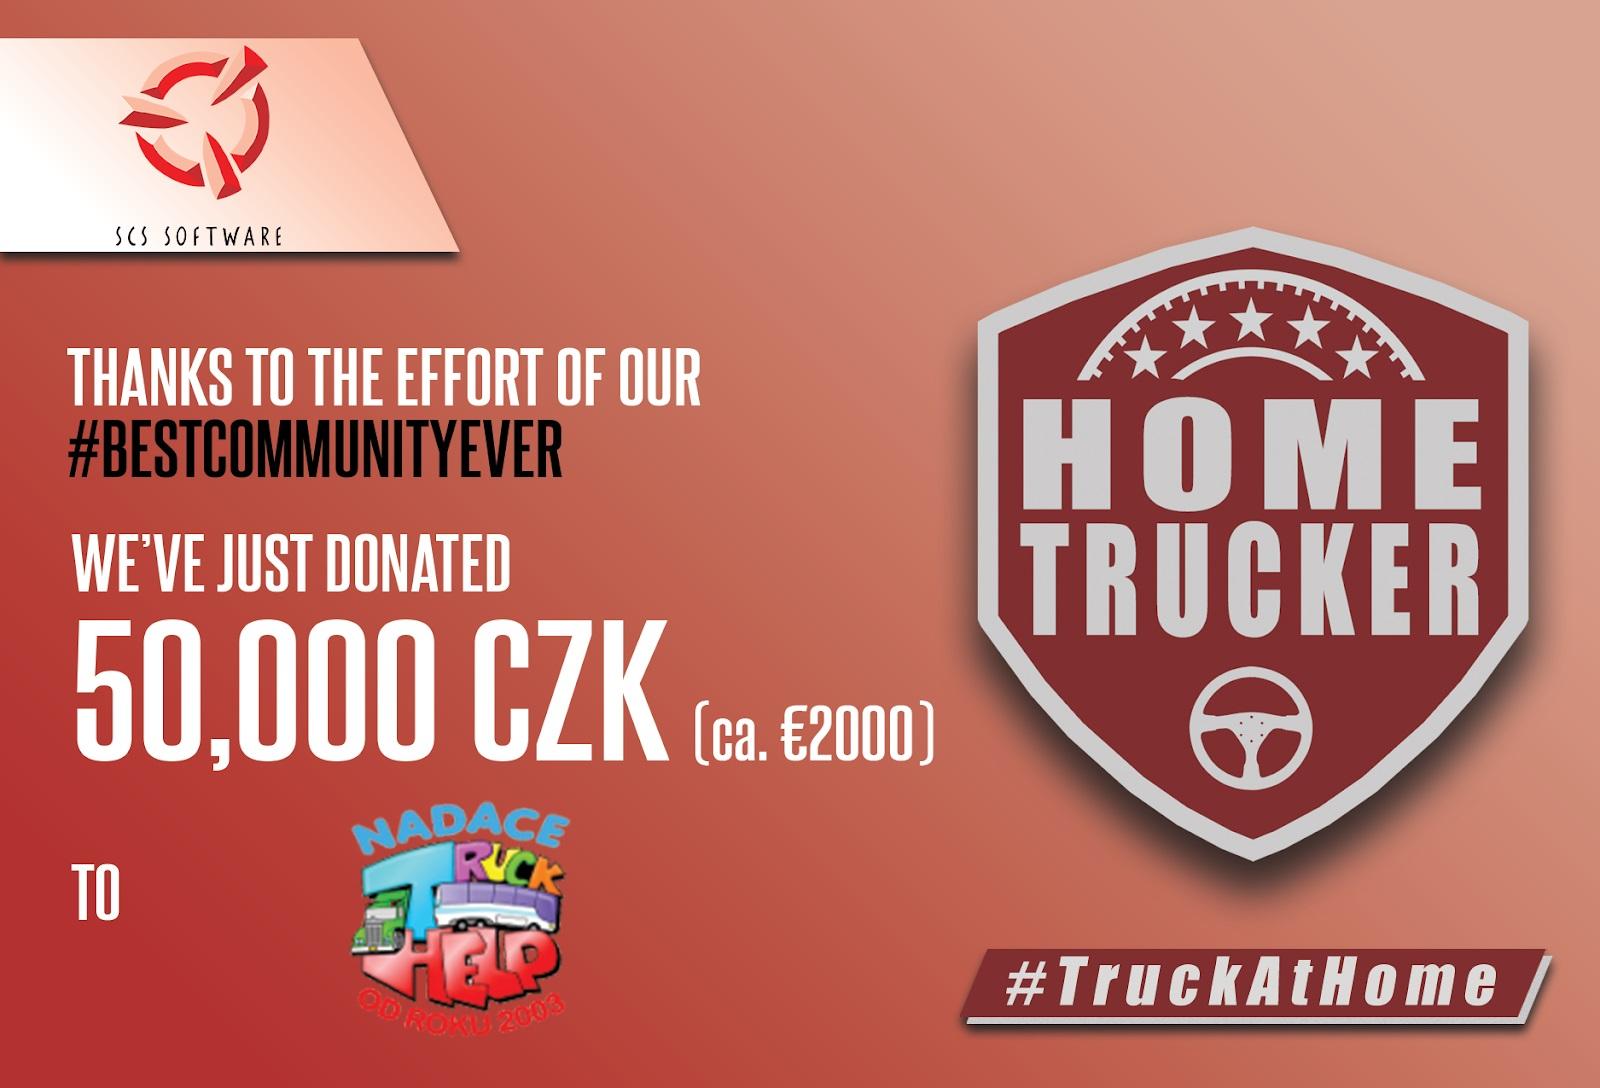 2020-TruckAtHome-nadace_truck_help.jpg